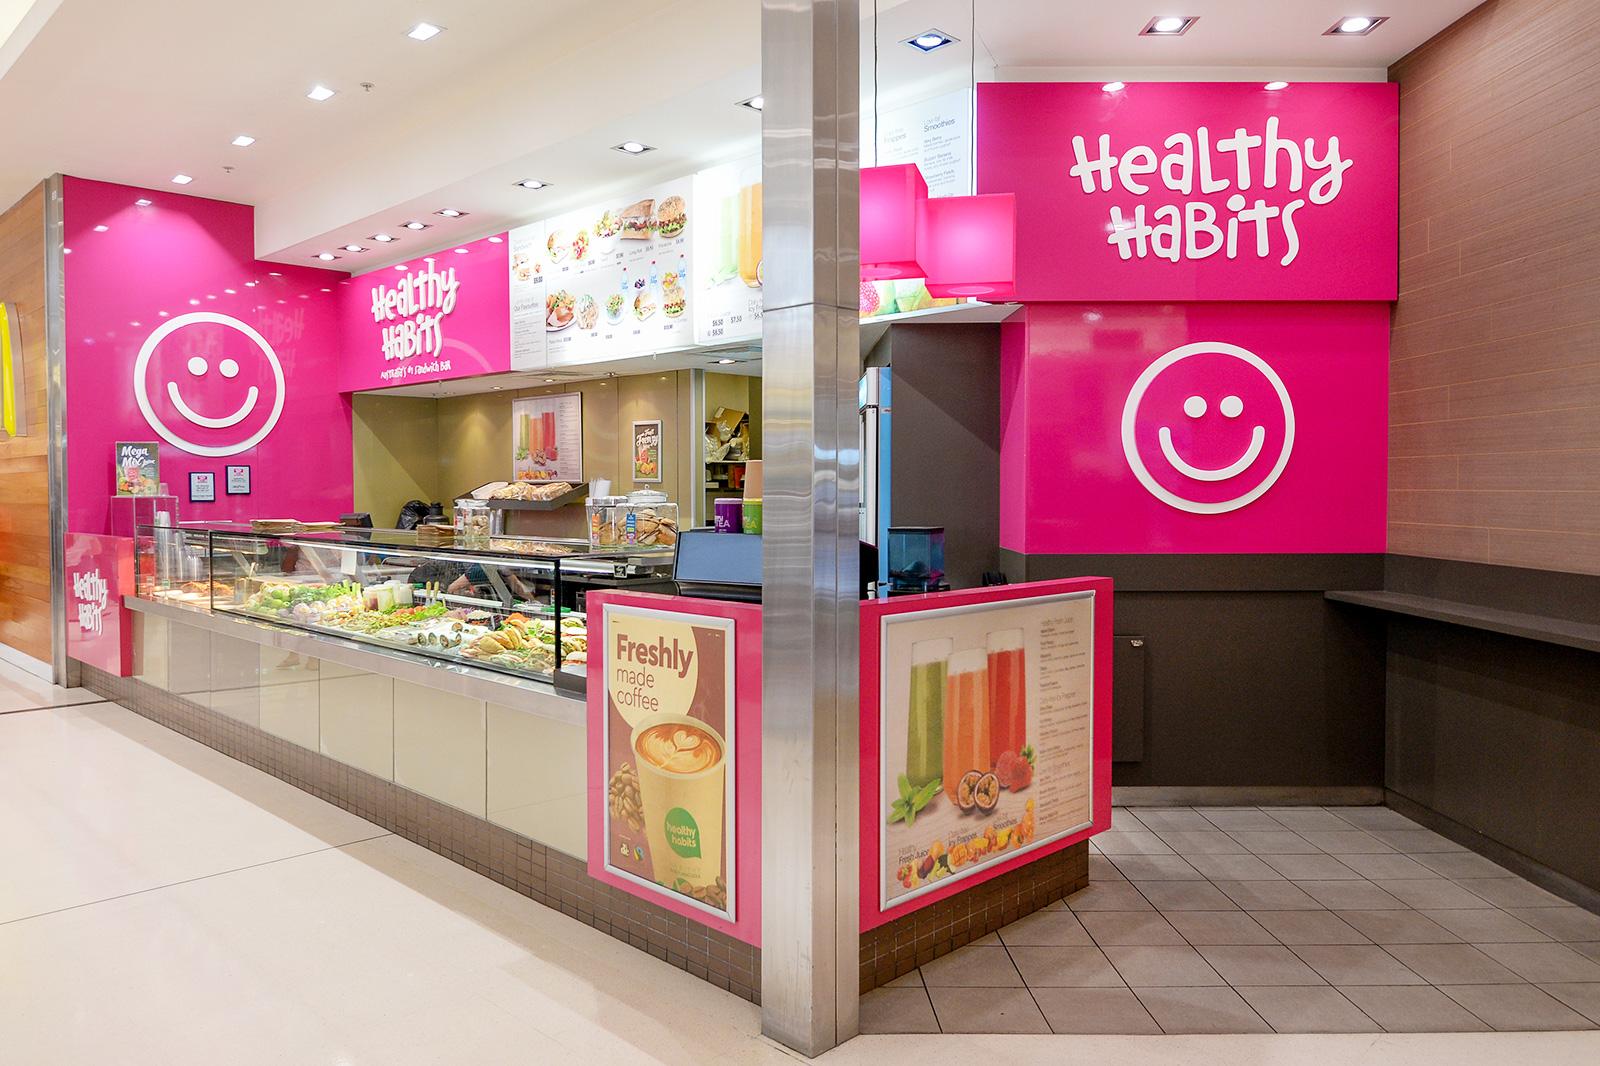 take-a-way-sandwich-shop-healthy-habits-grafton-shopping-world-reduced-price-4